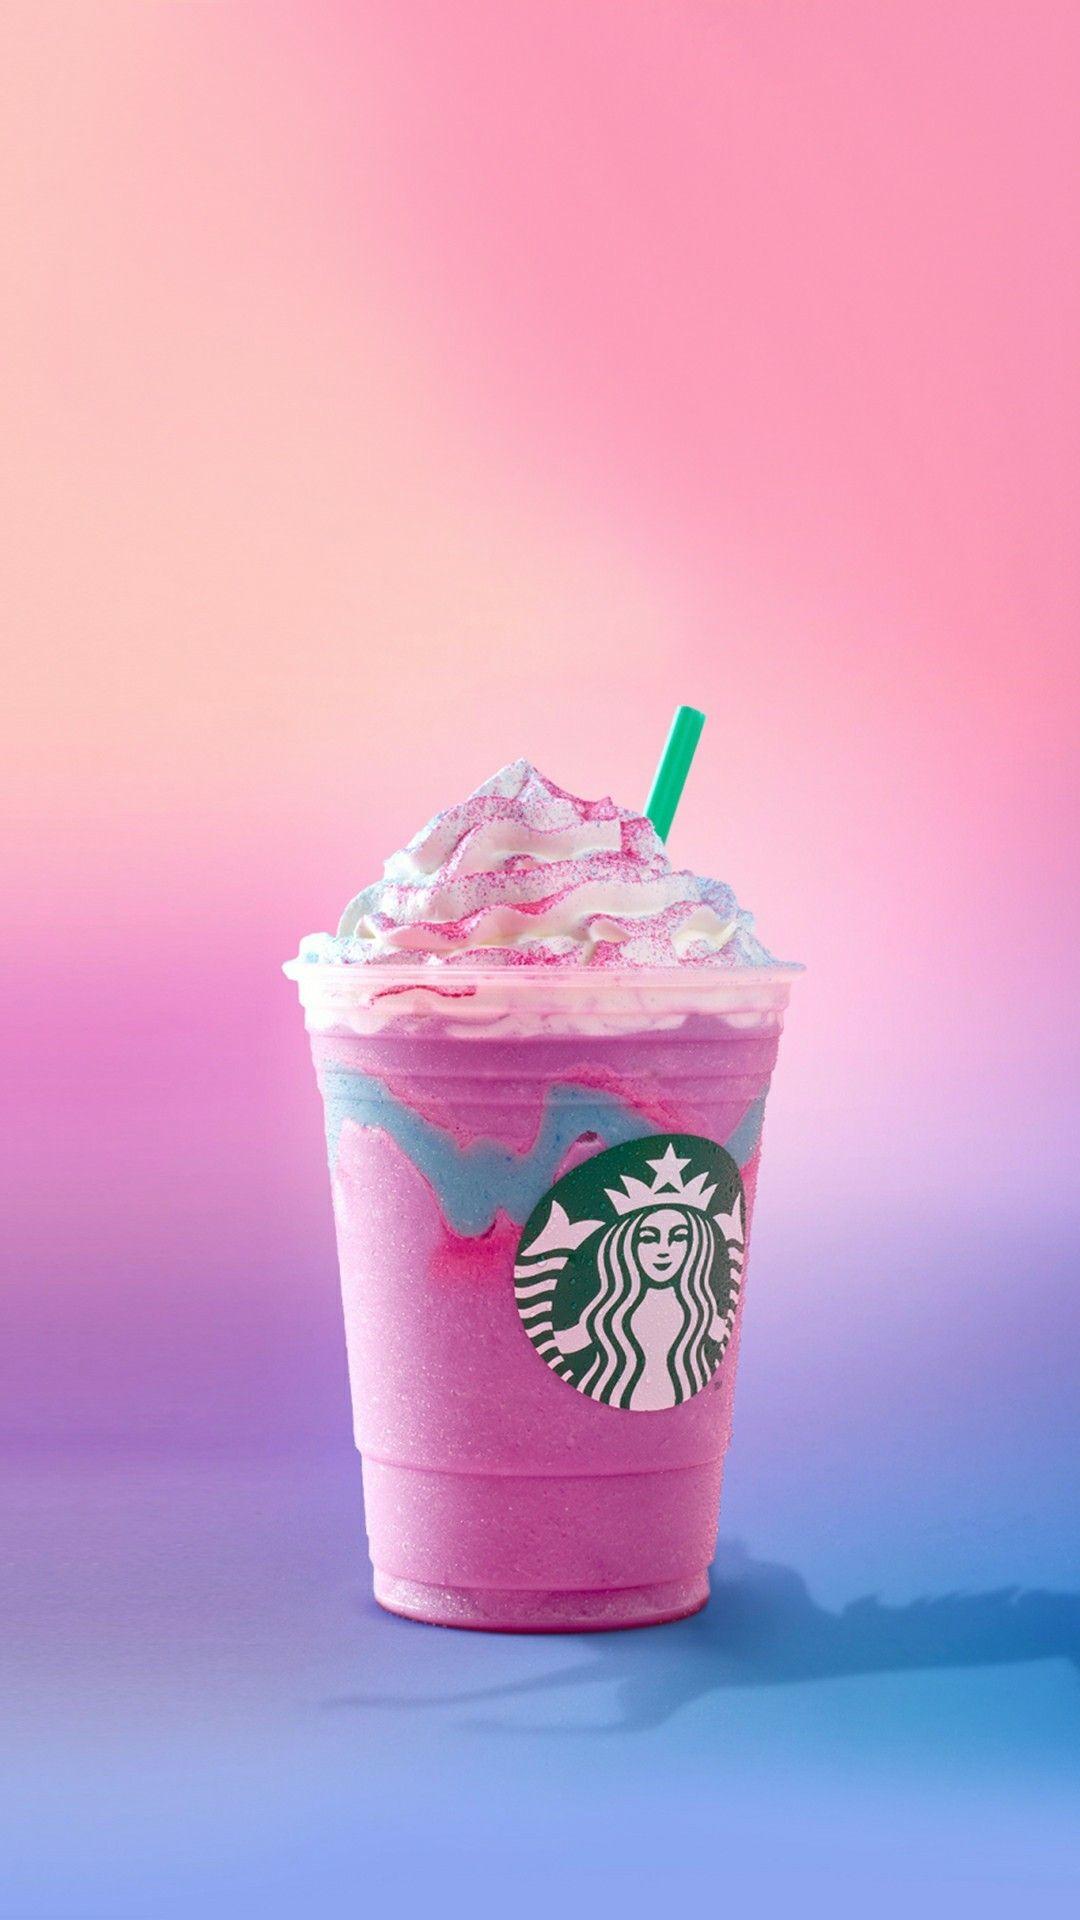 Pin by Tina Xu on Starbucks Starbucks drinks, Starbucks